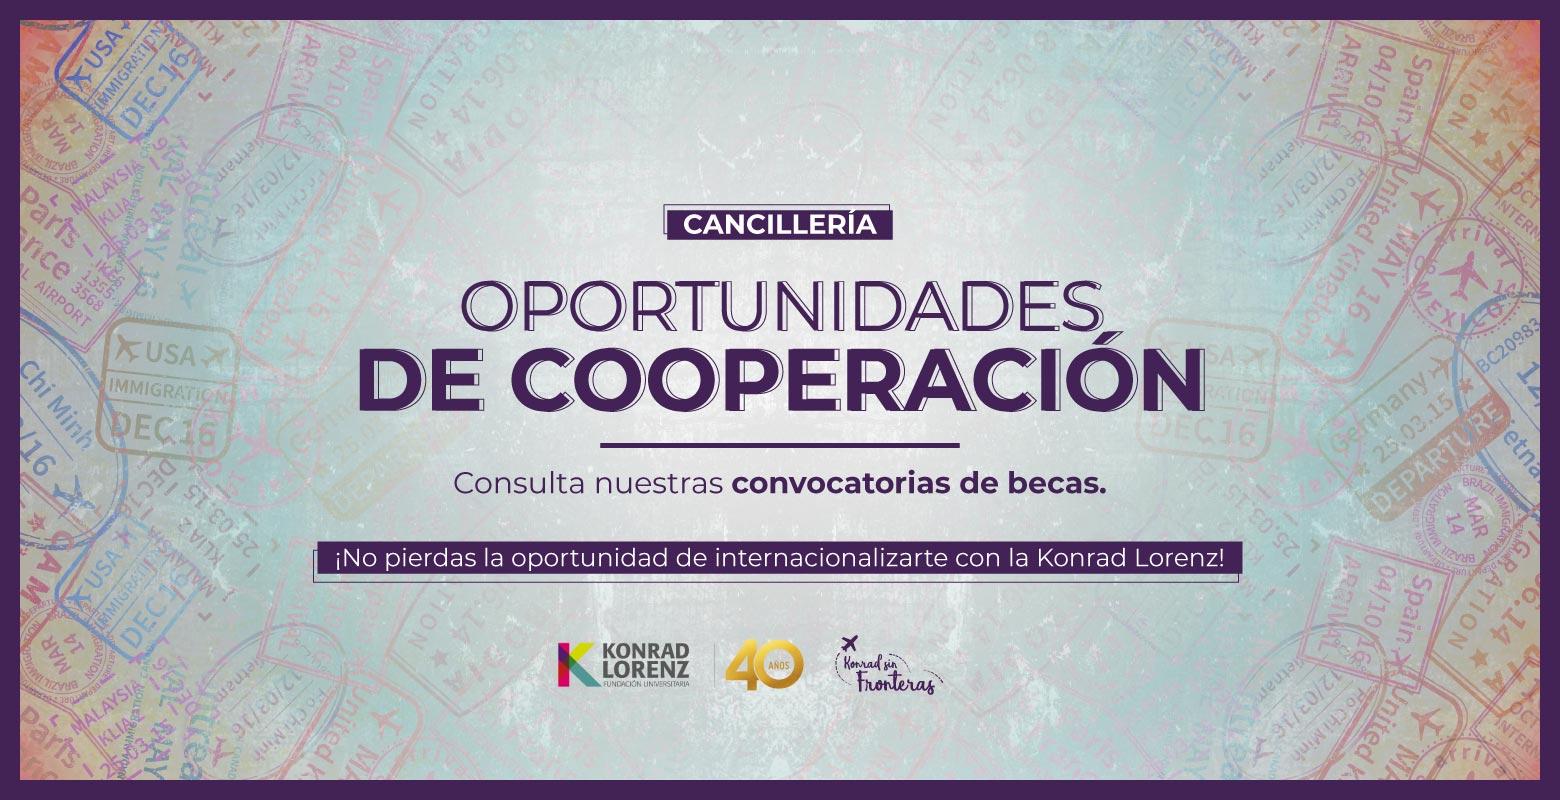 Cancillería: Oportunidades de Cooperación